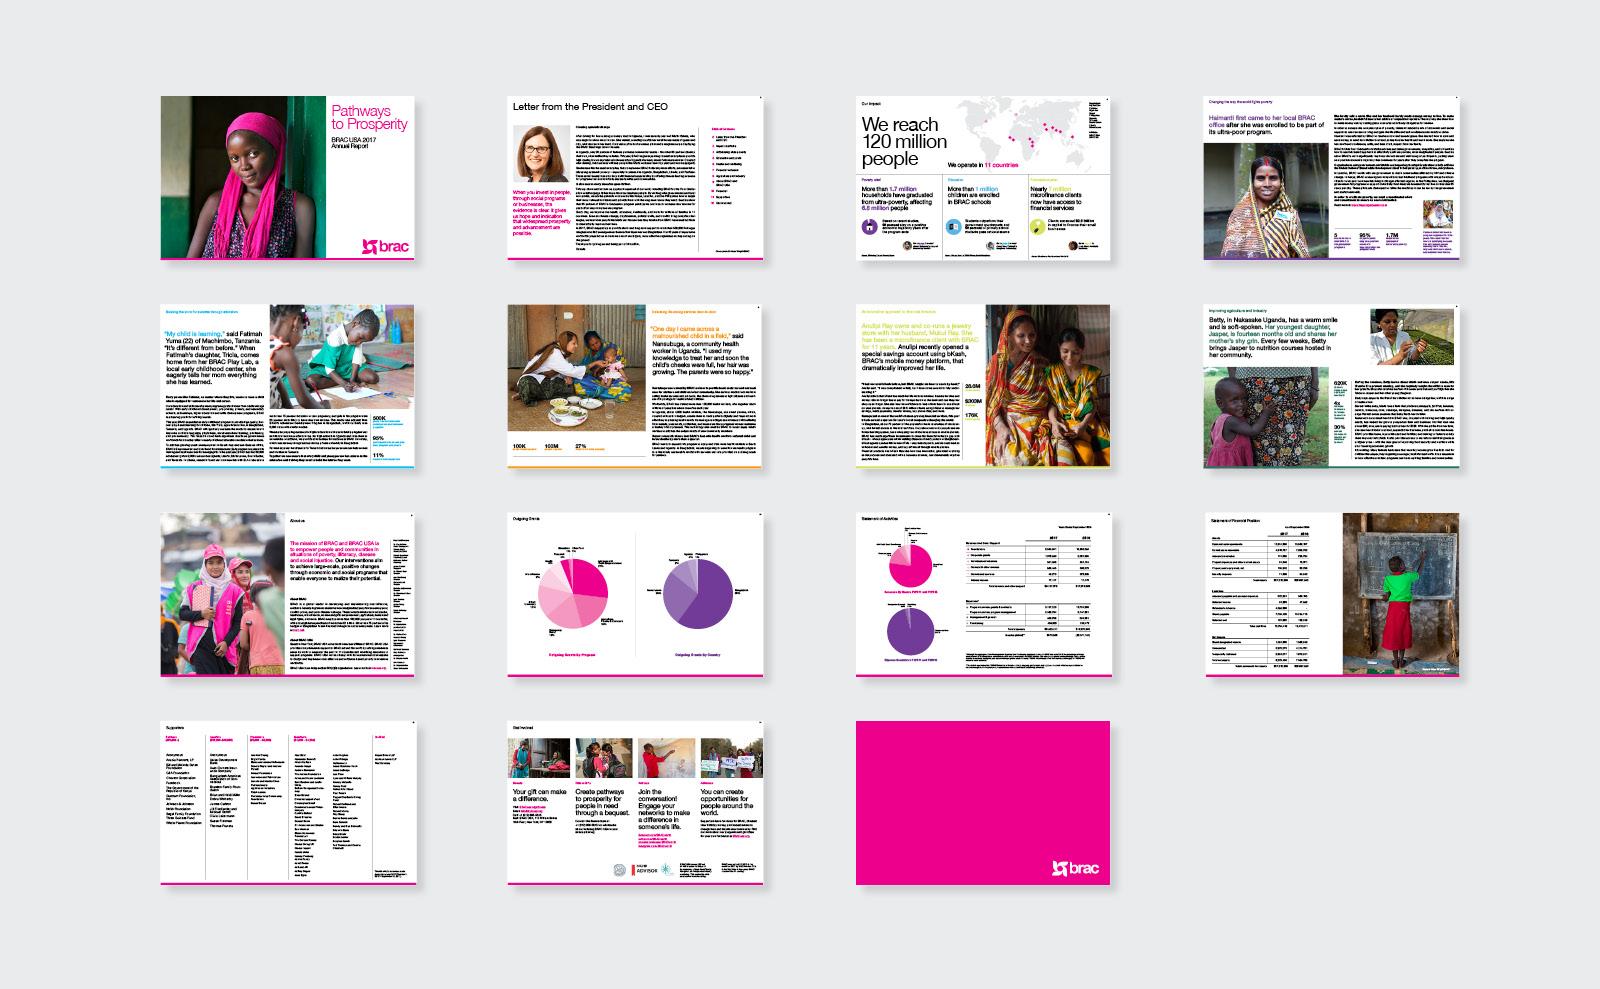 BRAC annual report design spreads